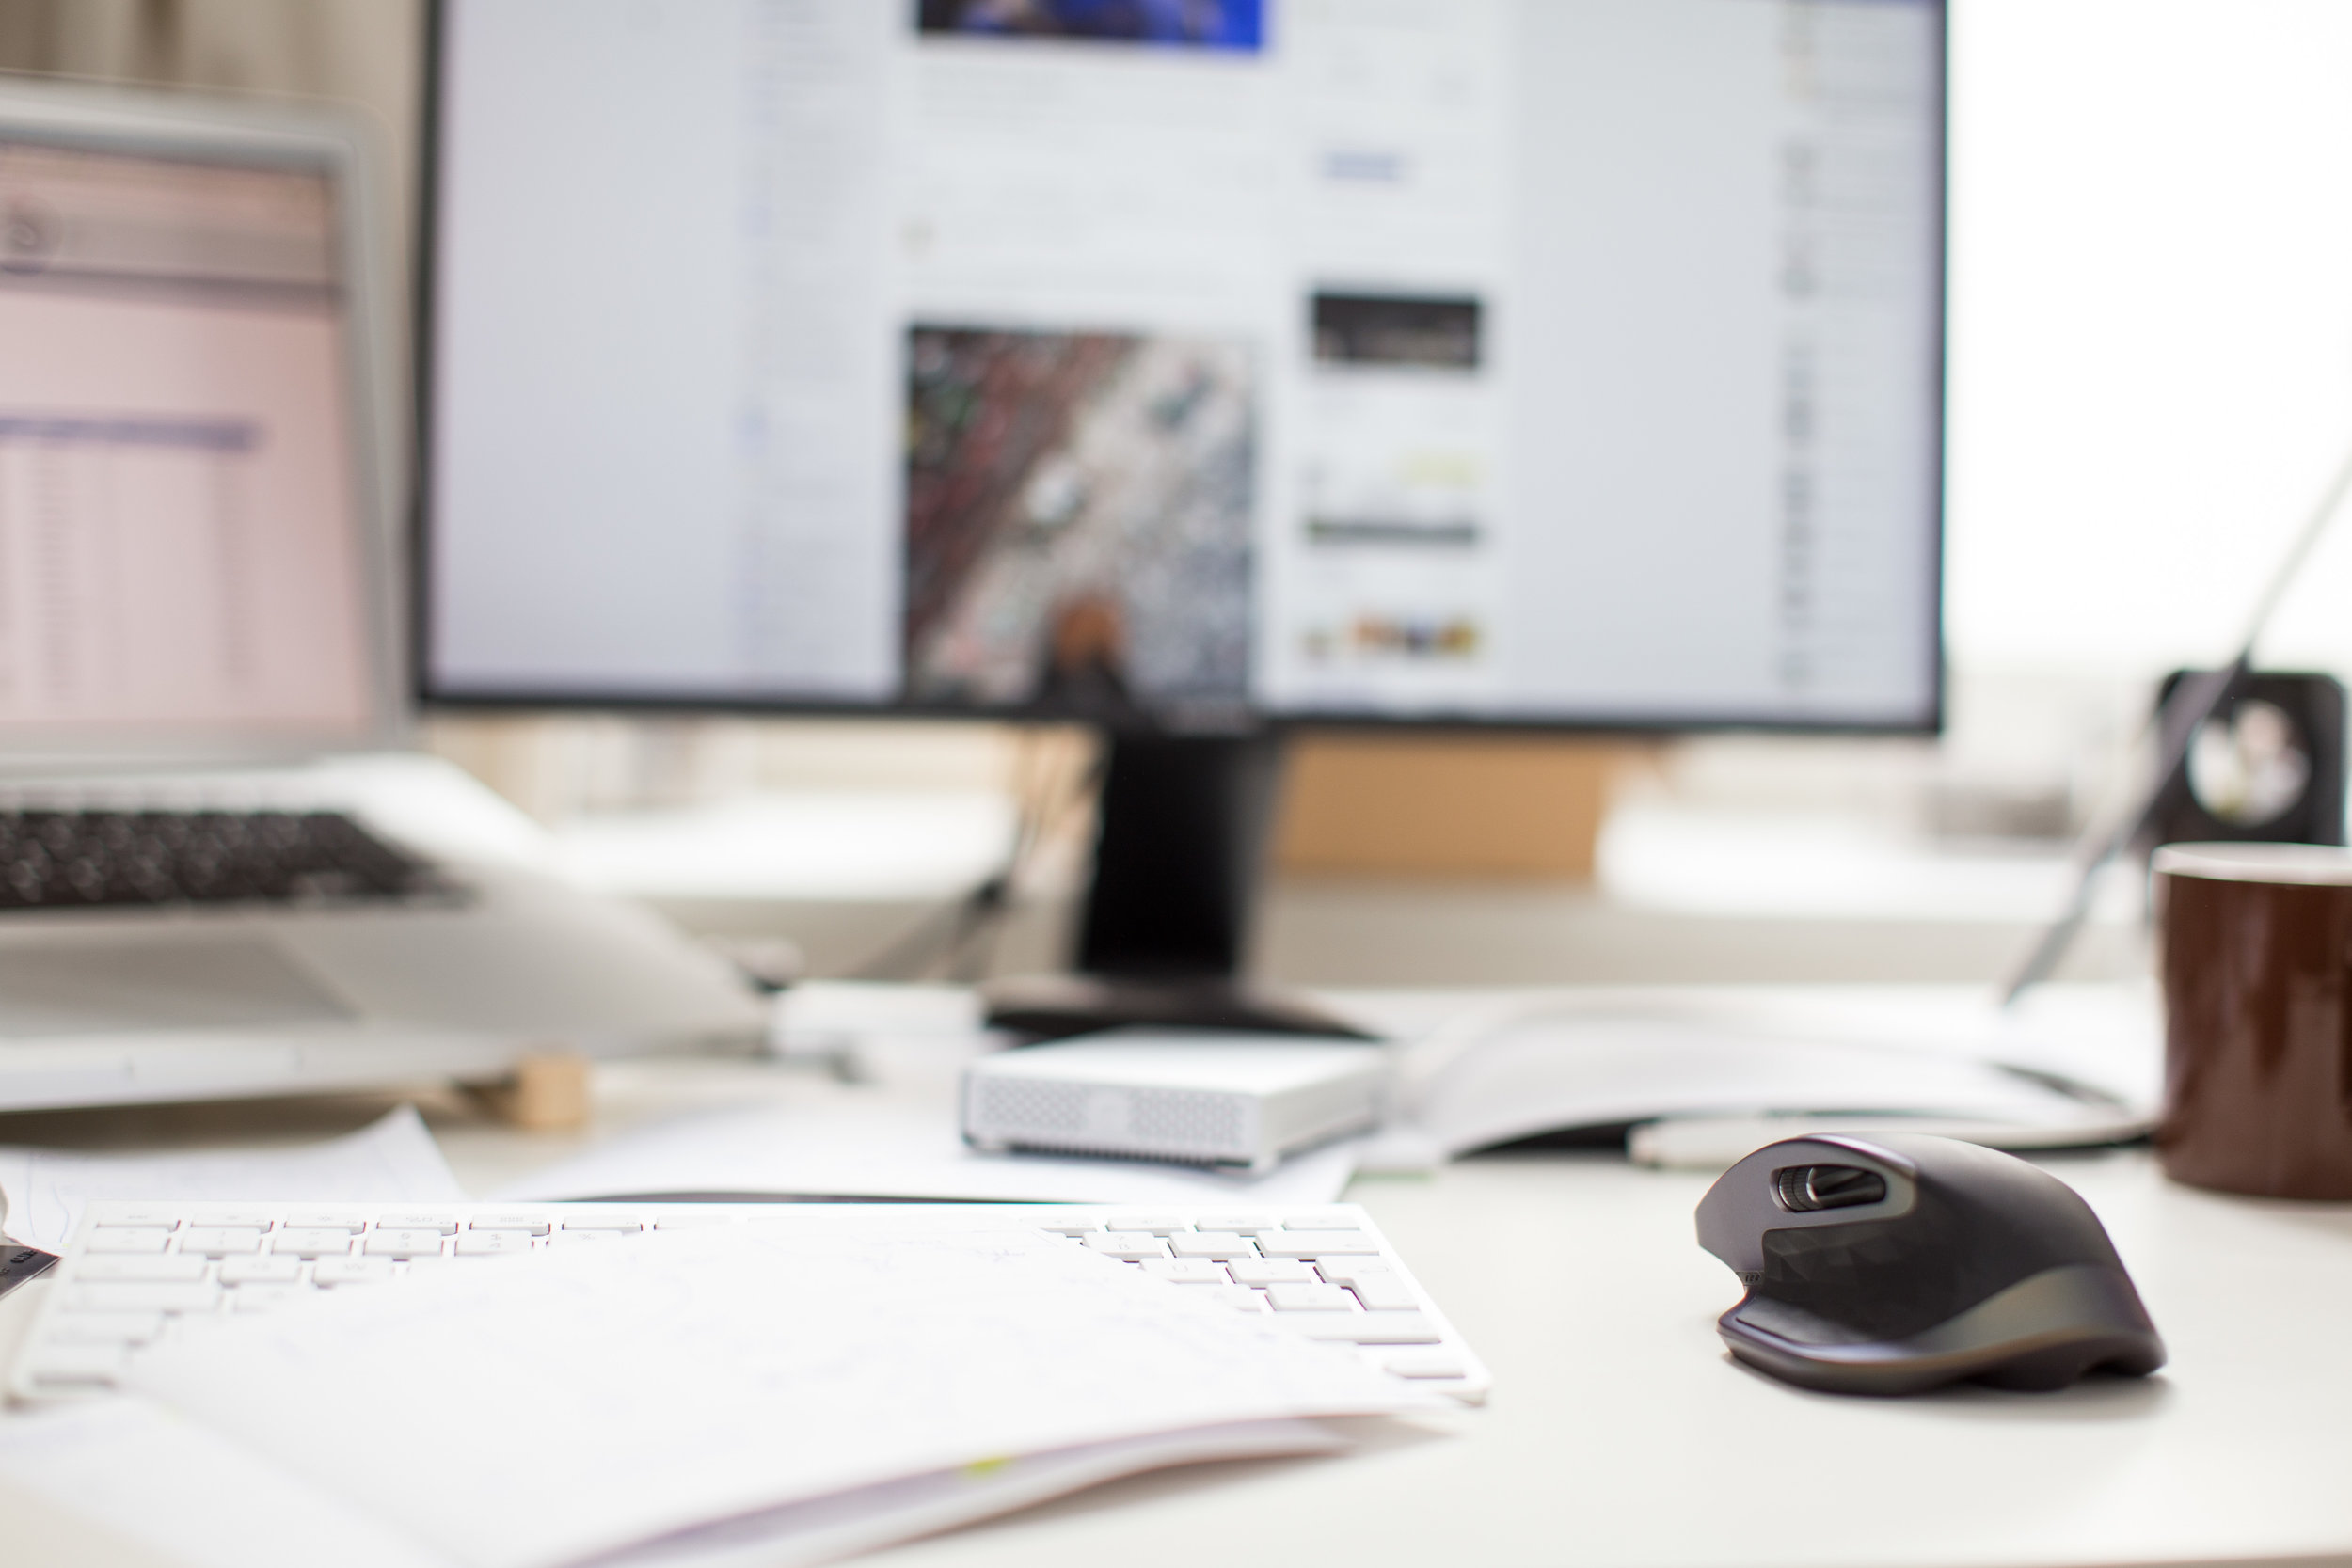 Office-Desk-Laptop-Notebook-via-Pexels_19.jpeg